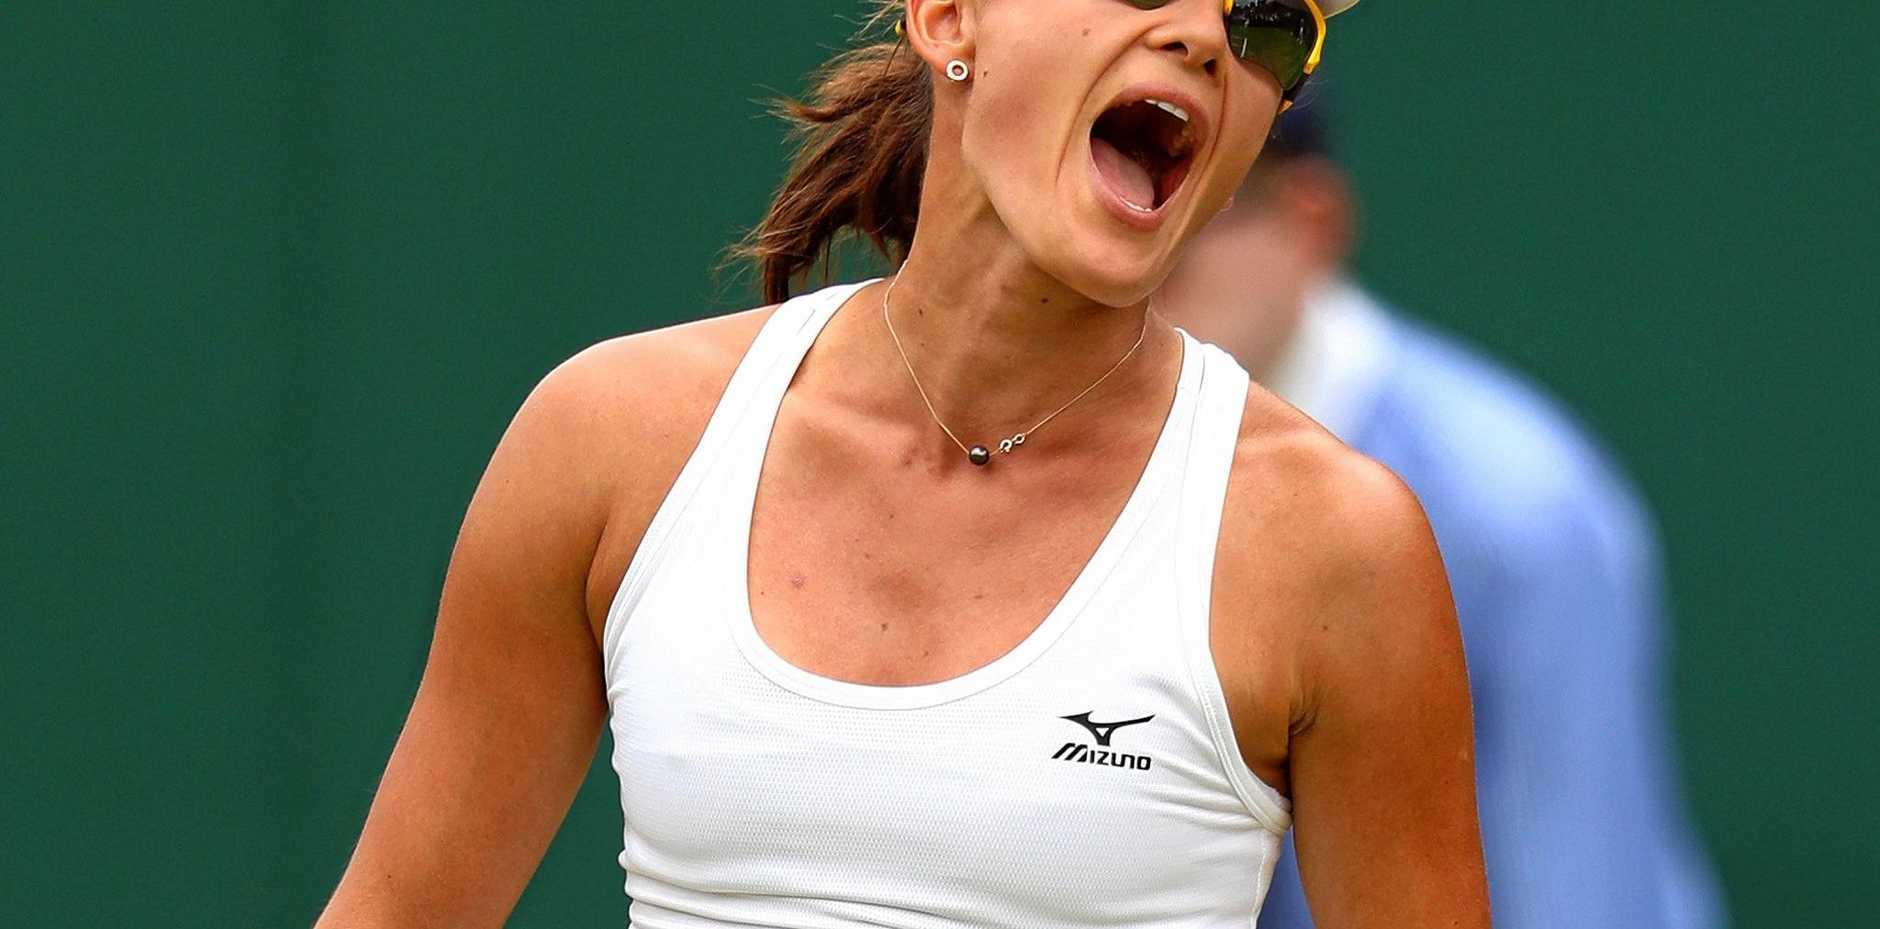 Arina Rodionova during her first round match against Anastasia Pavlyuchenkova at Wimbledon